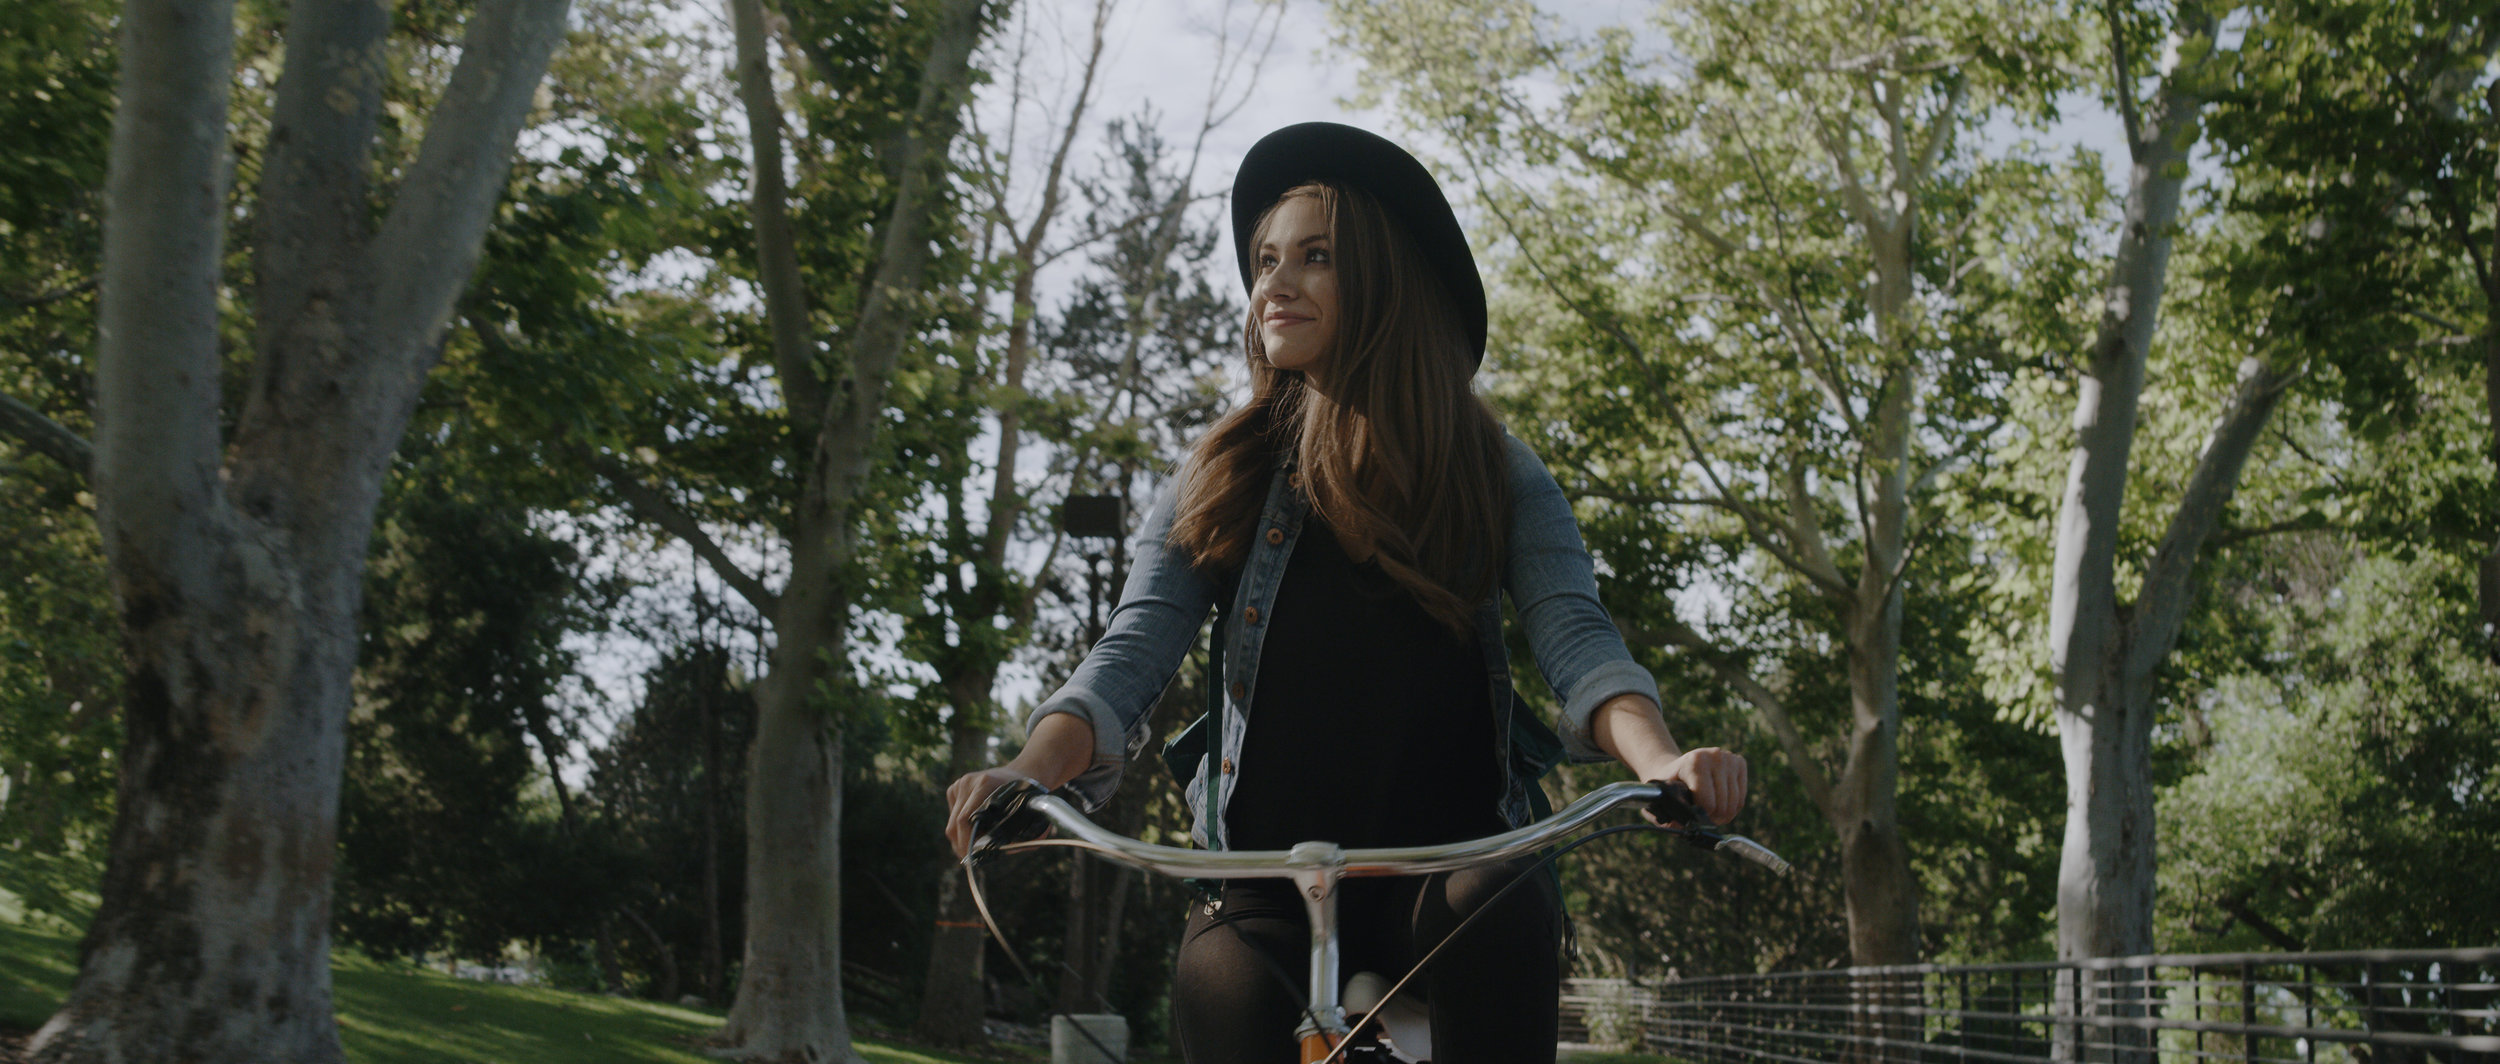 Girl Bikeriding Wide.jpg